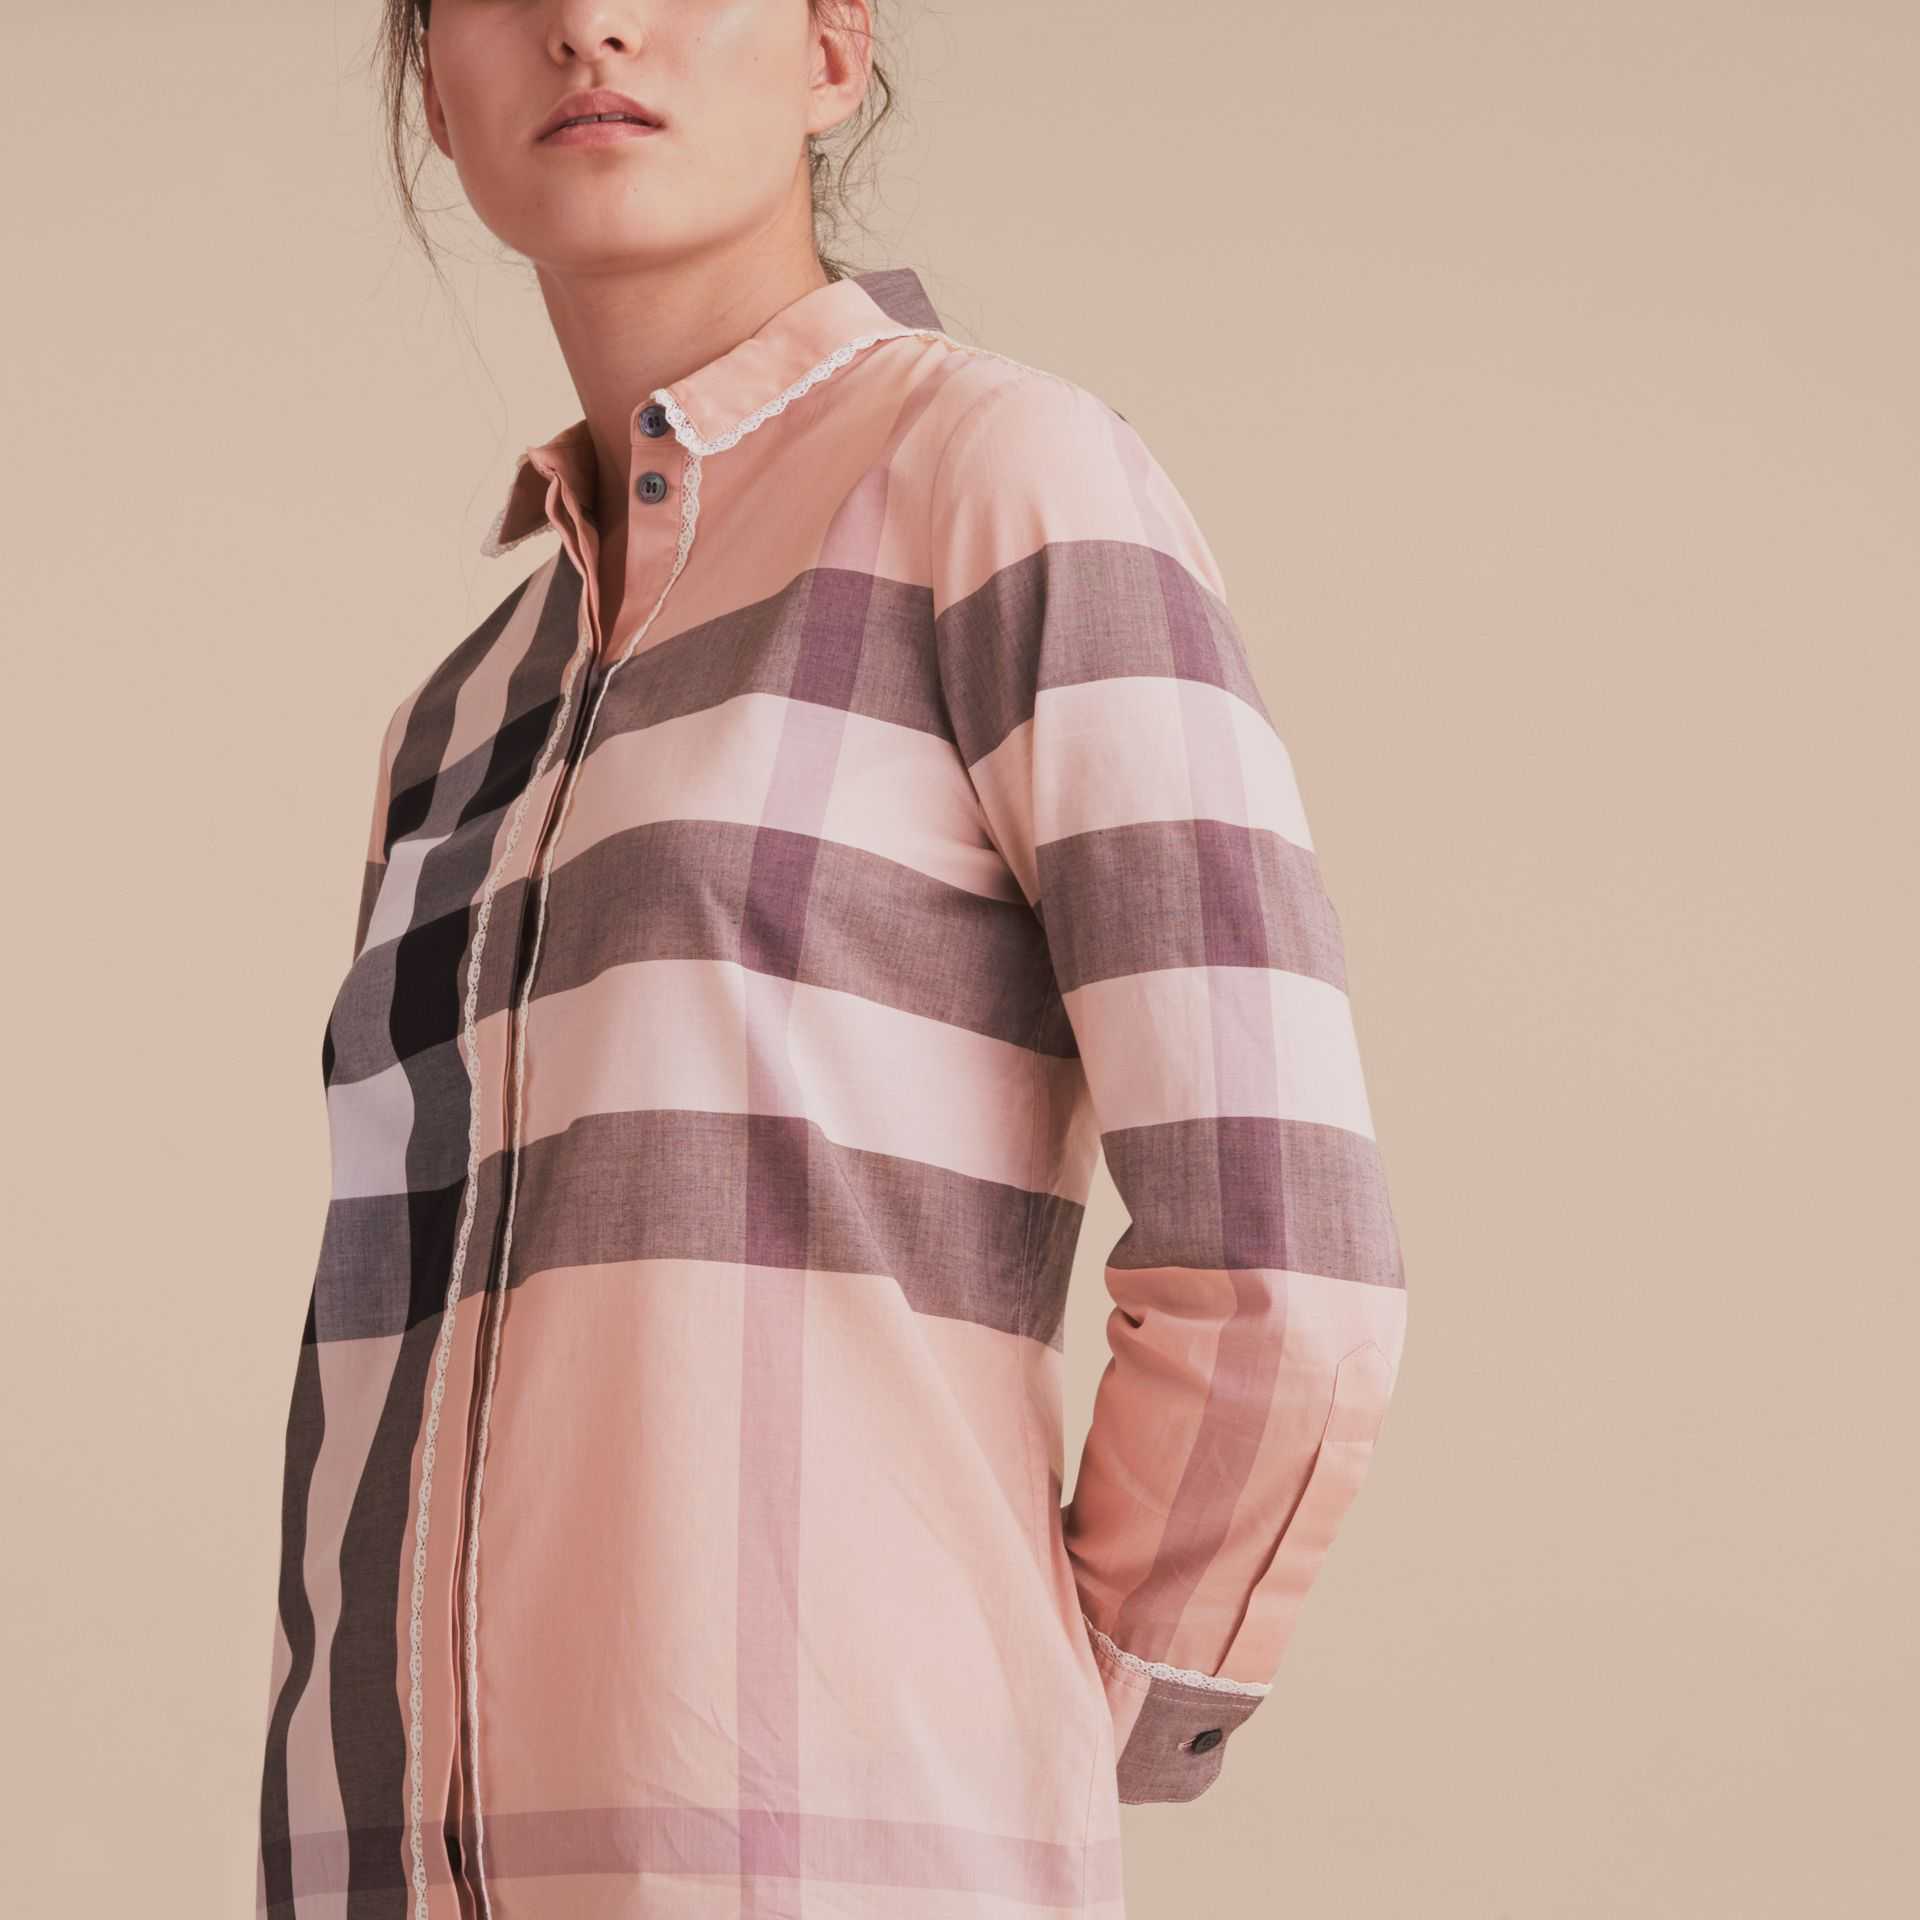 Lace Trim Check Cotton Shirt Antique Pink - gallery image 5